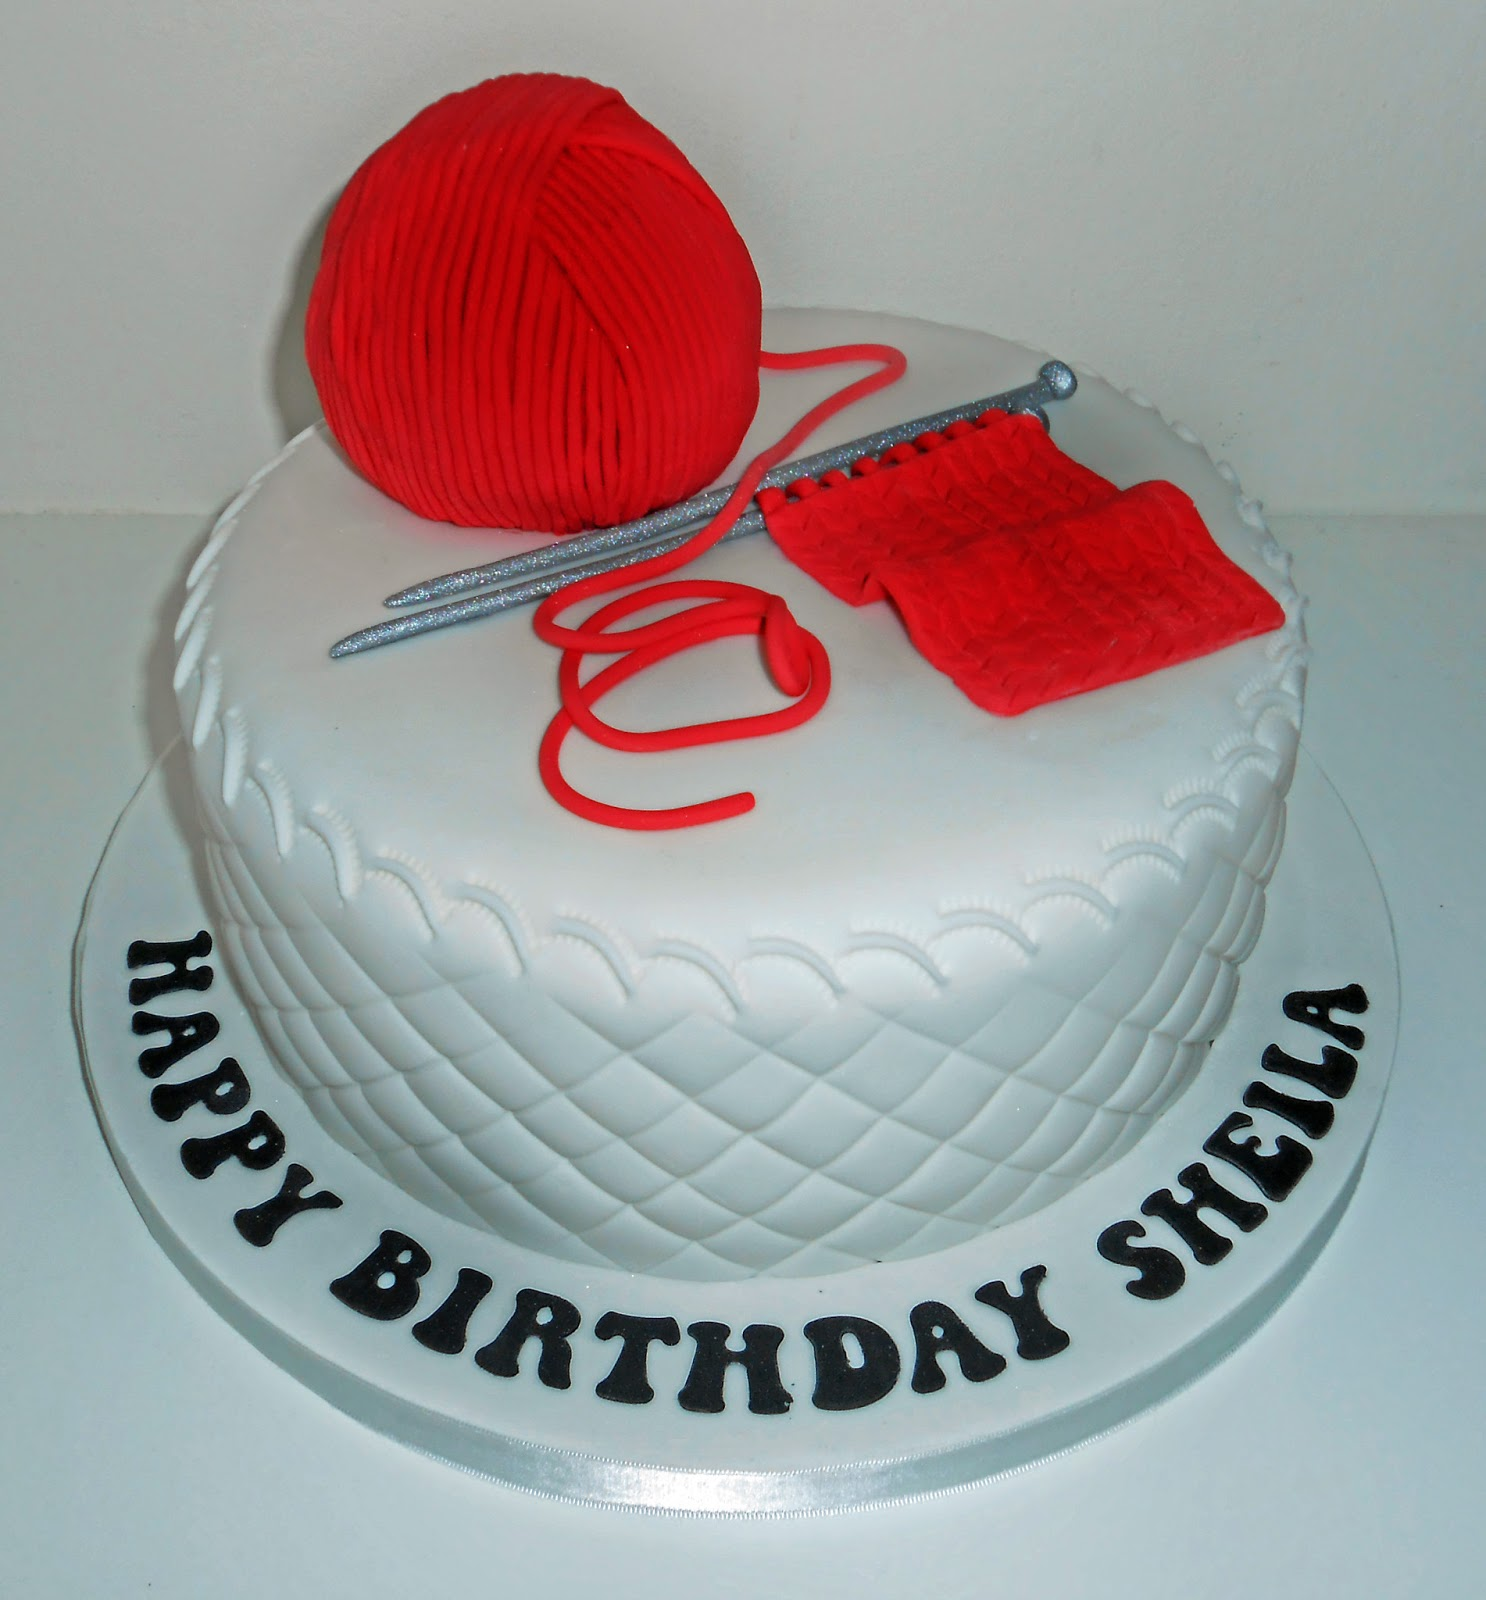 The Coloured Bubble Cakery Knitting Cake